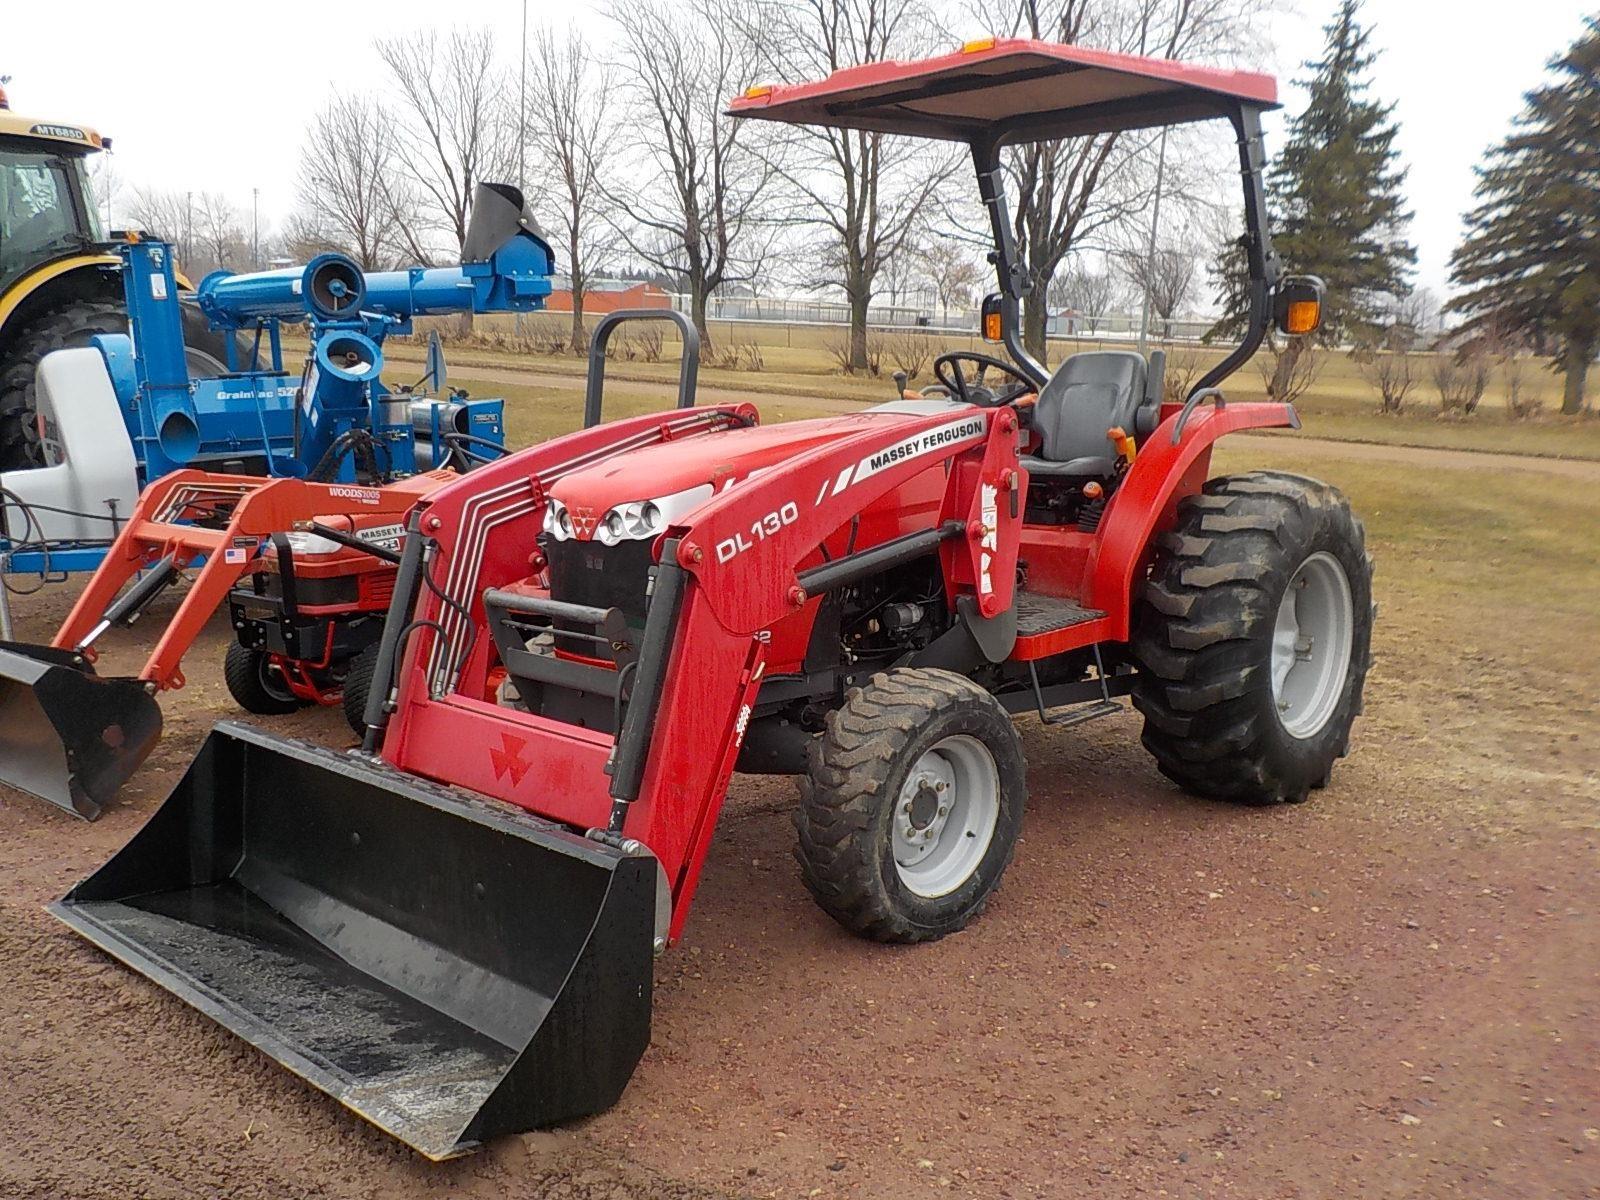 2010 Massey Ferguson 1652 Tractor